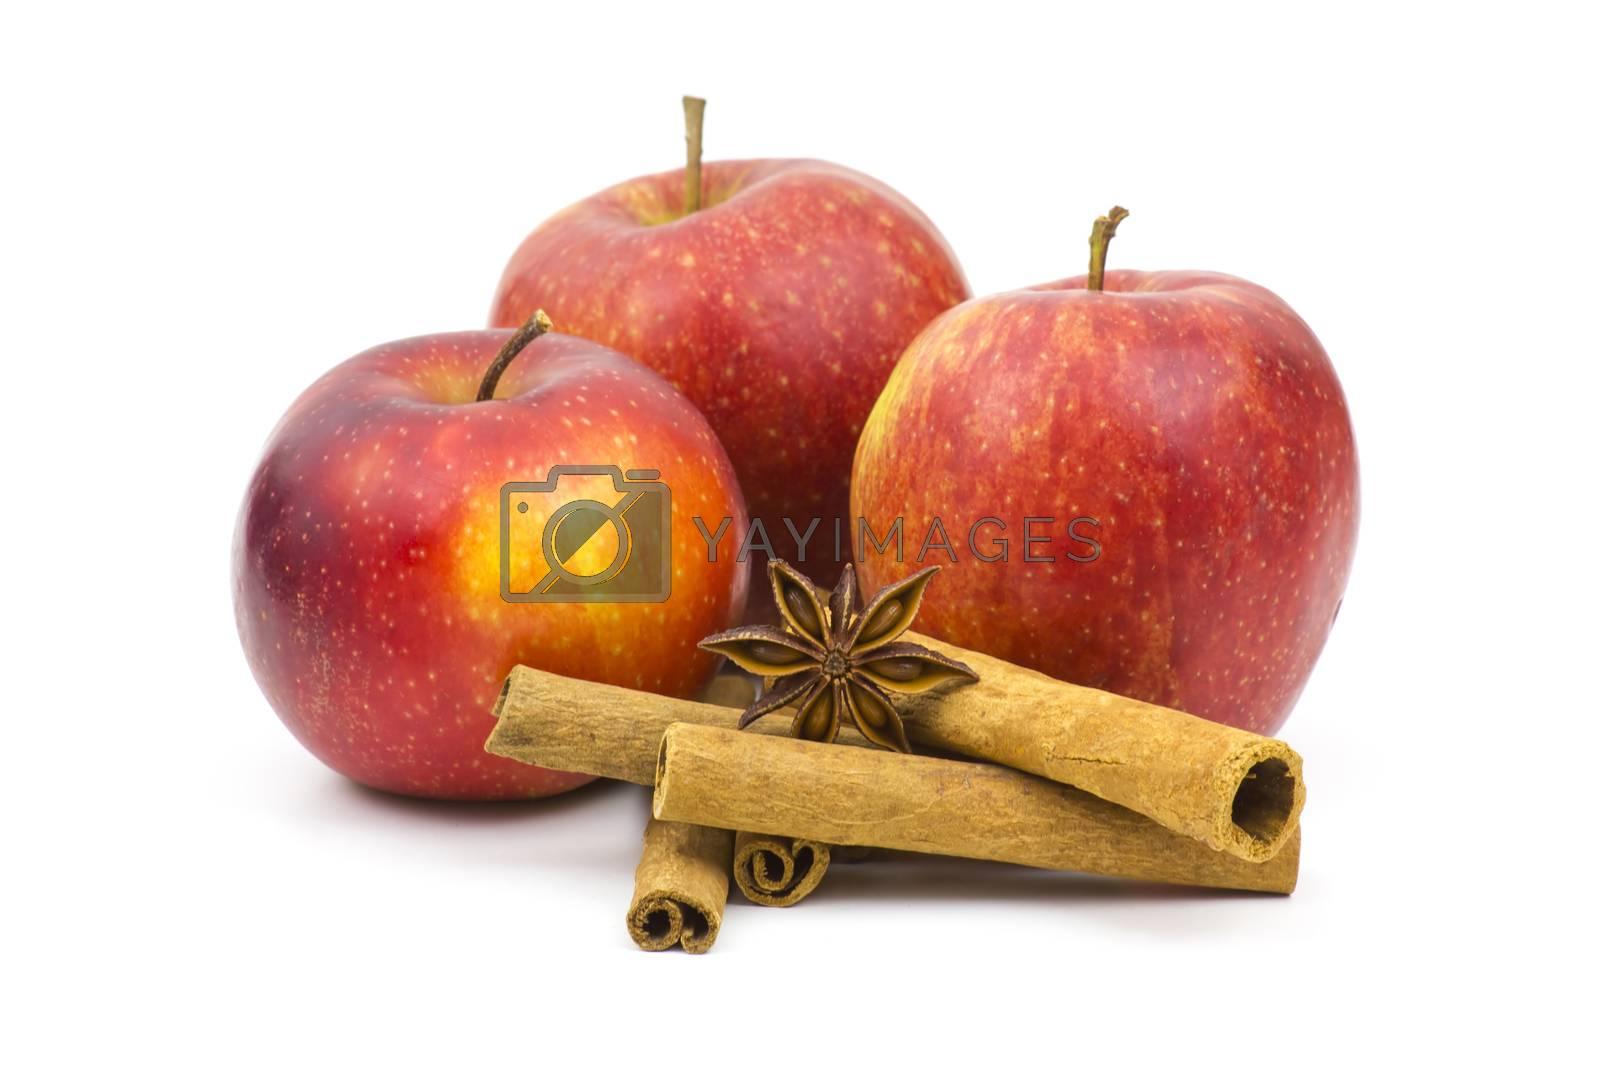 apples, cinnamon sticks and anise by miradrozdowski